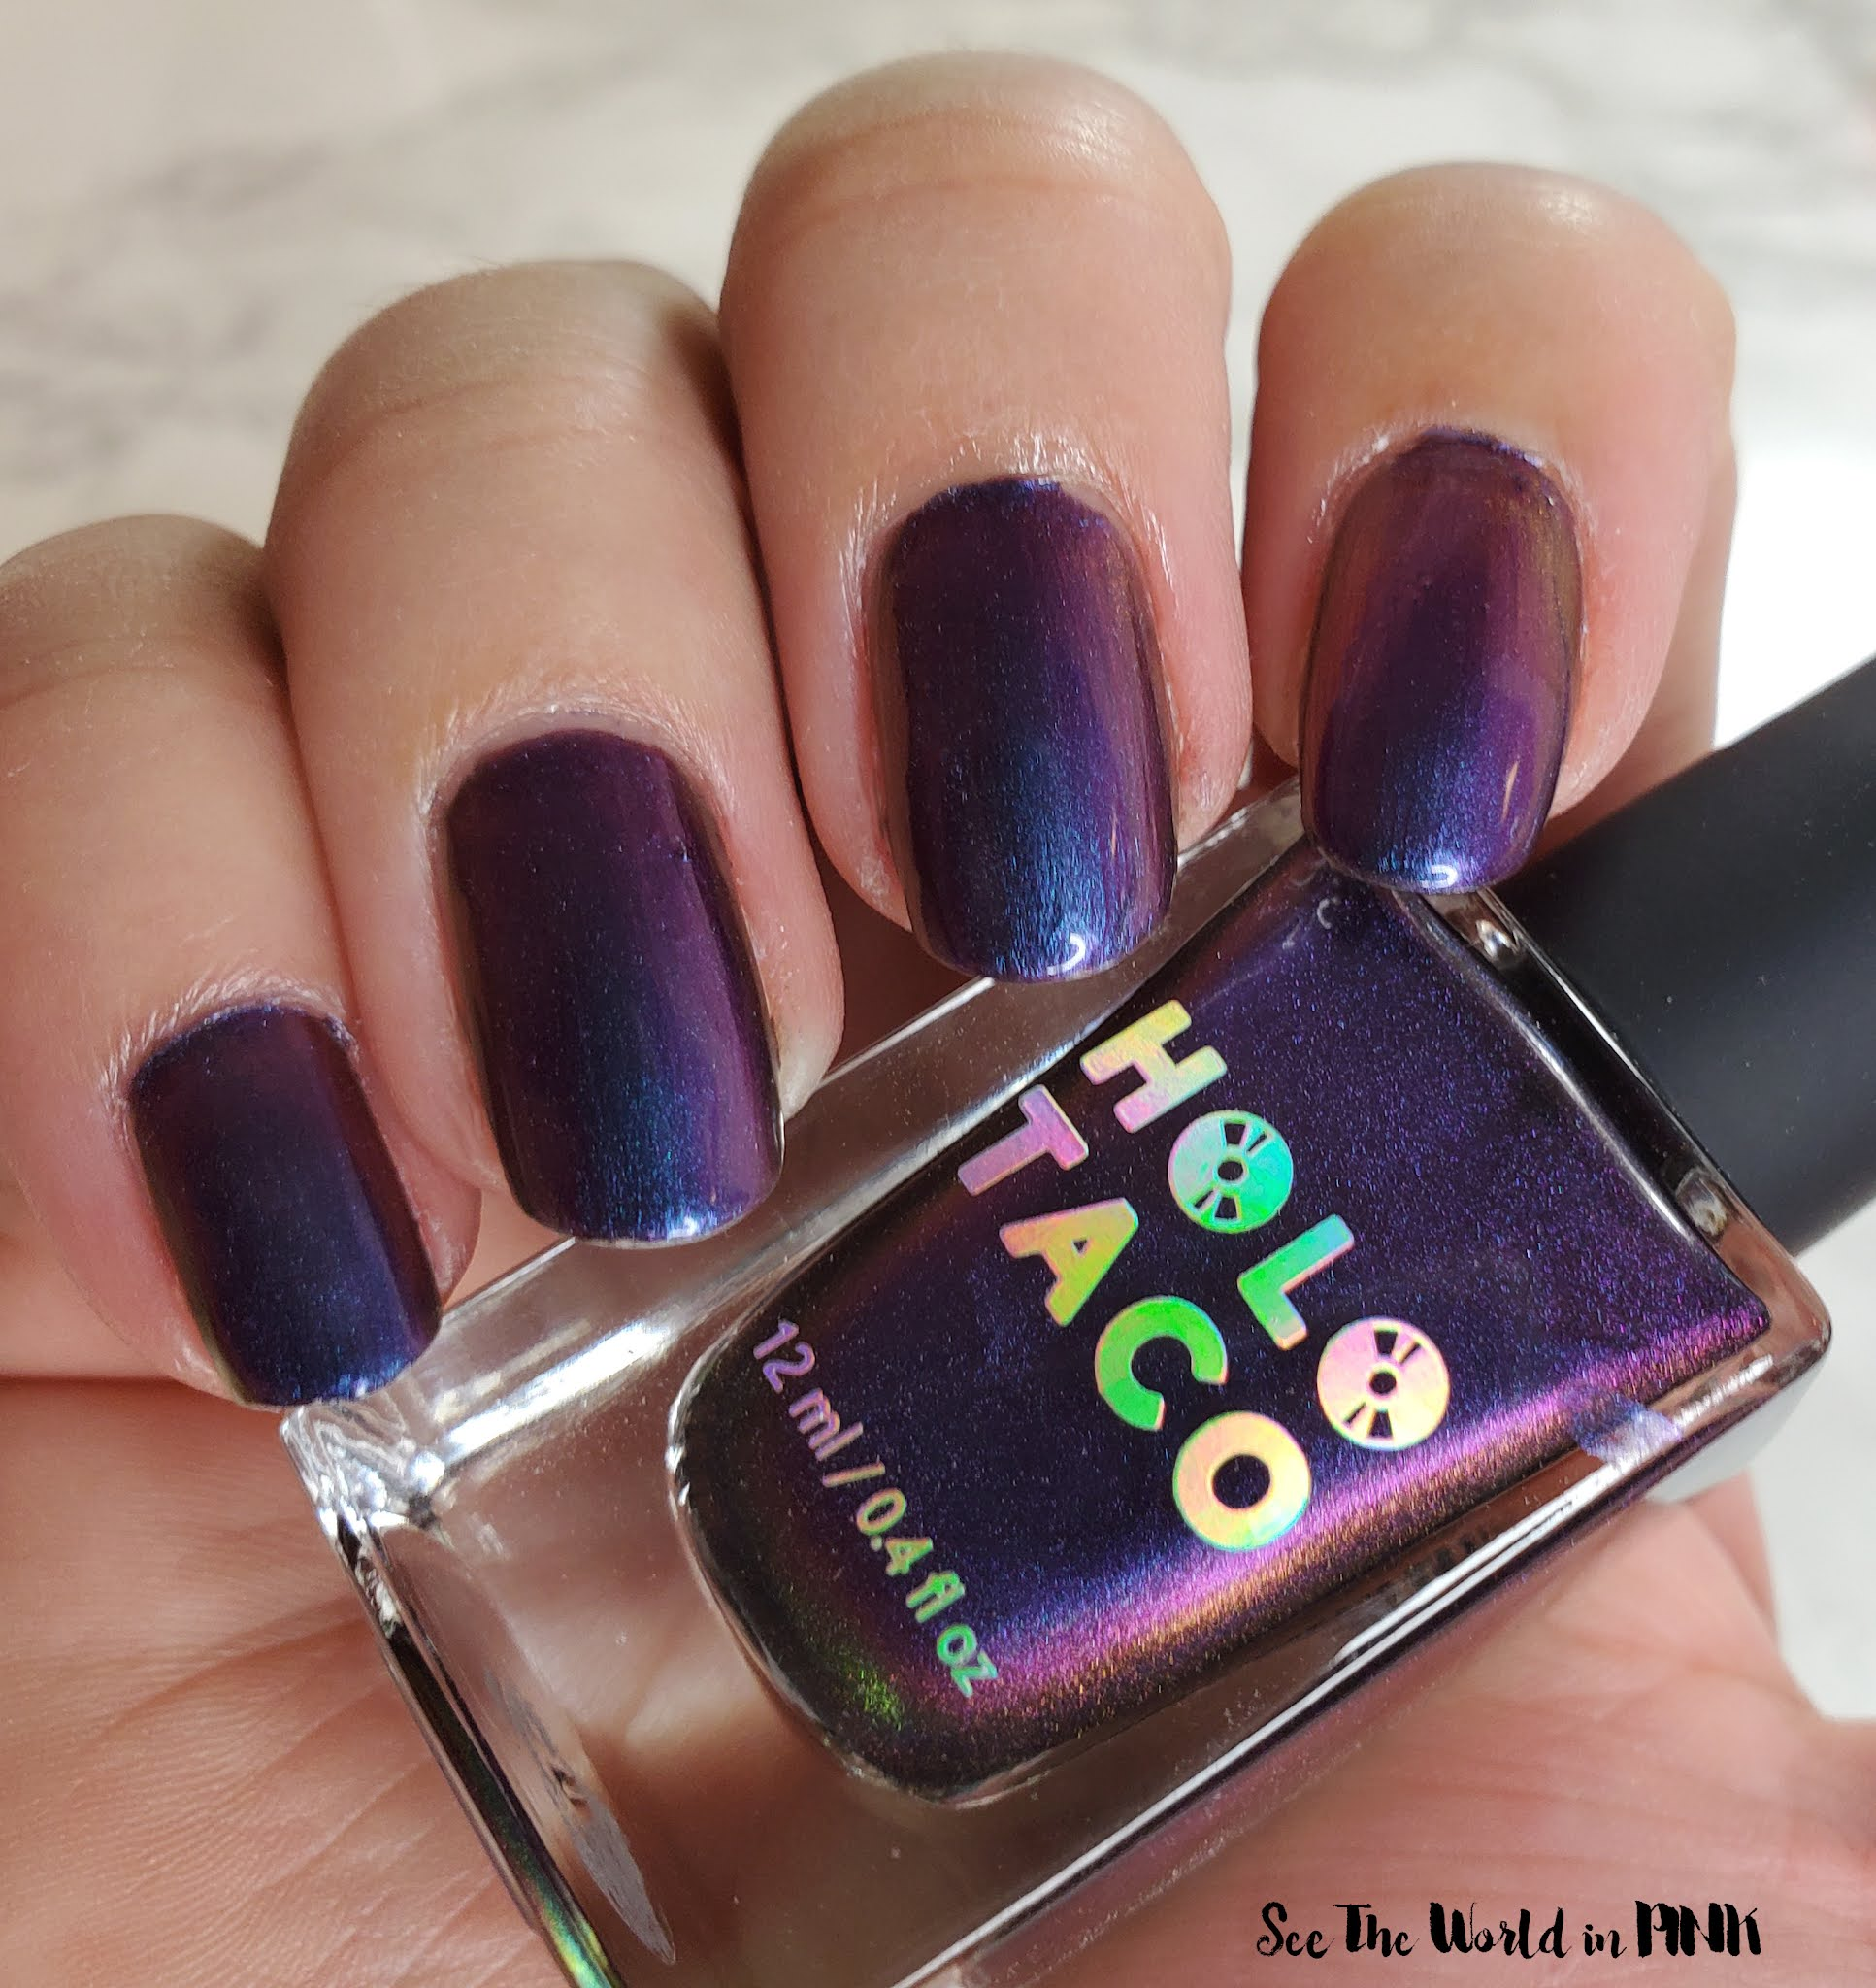 Manicure Monday - Holo Taco Purple With Envy Multichrome Polish